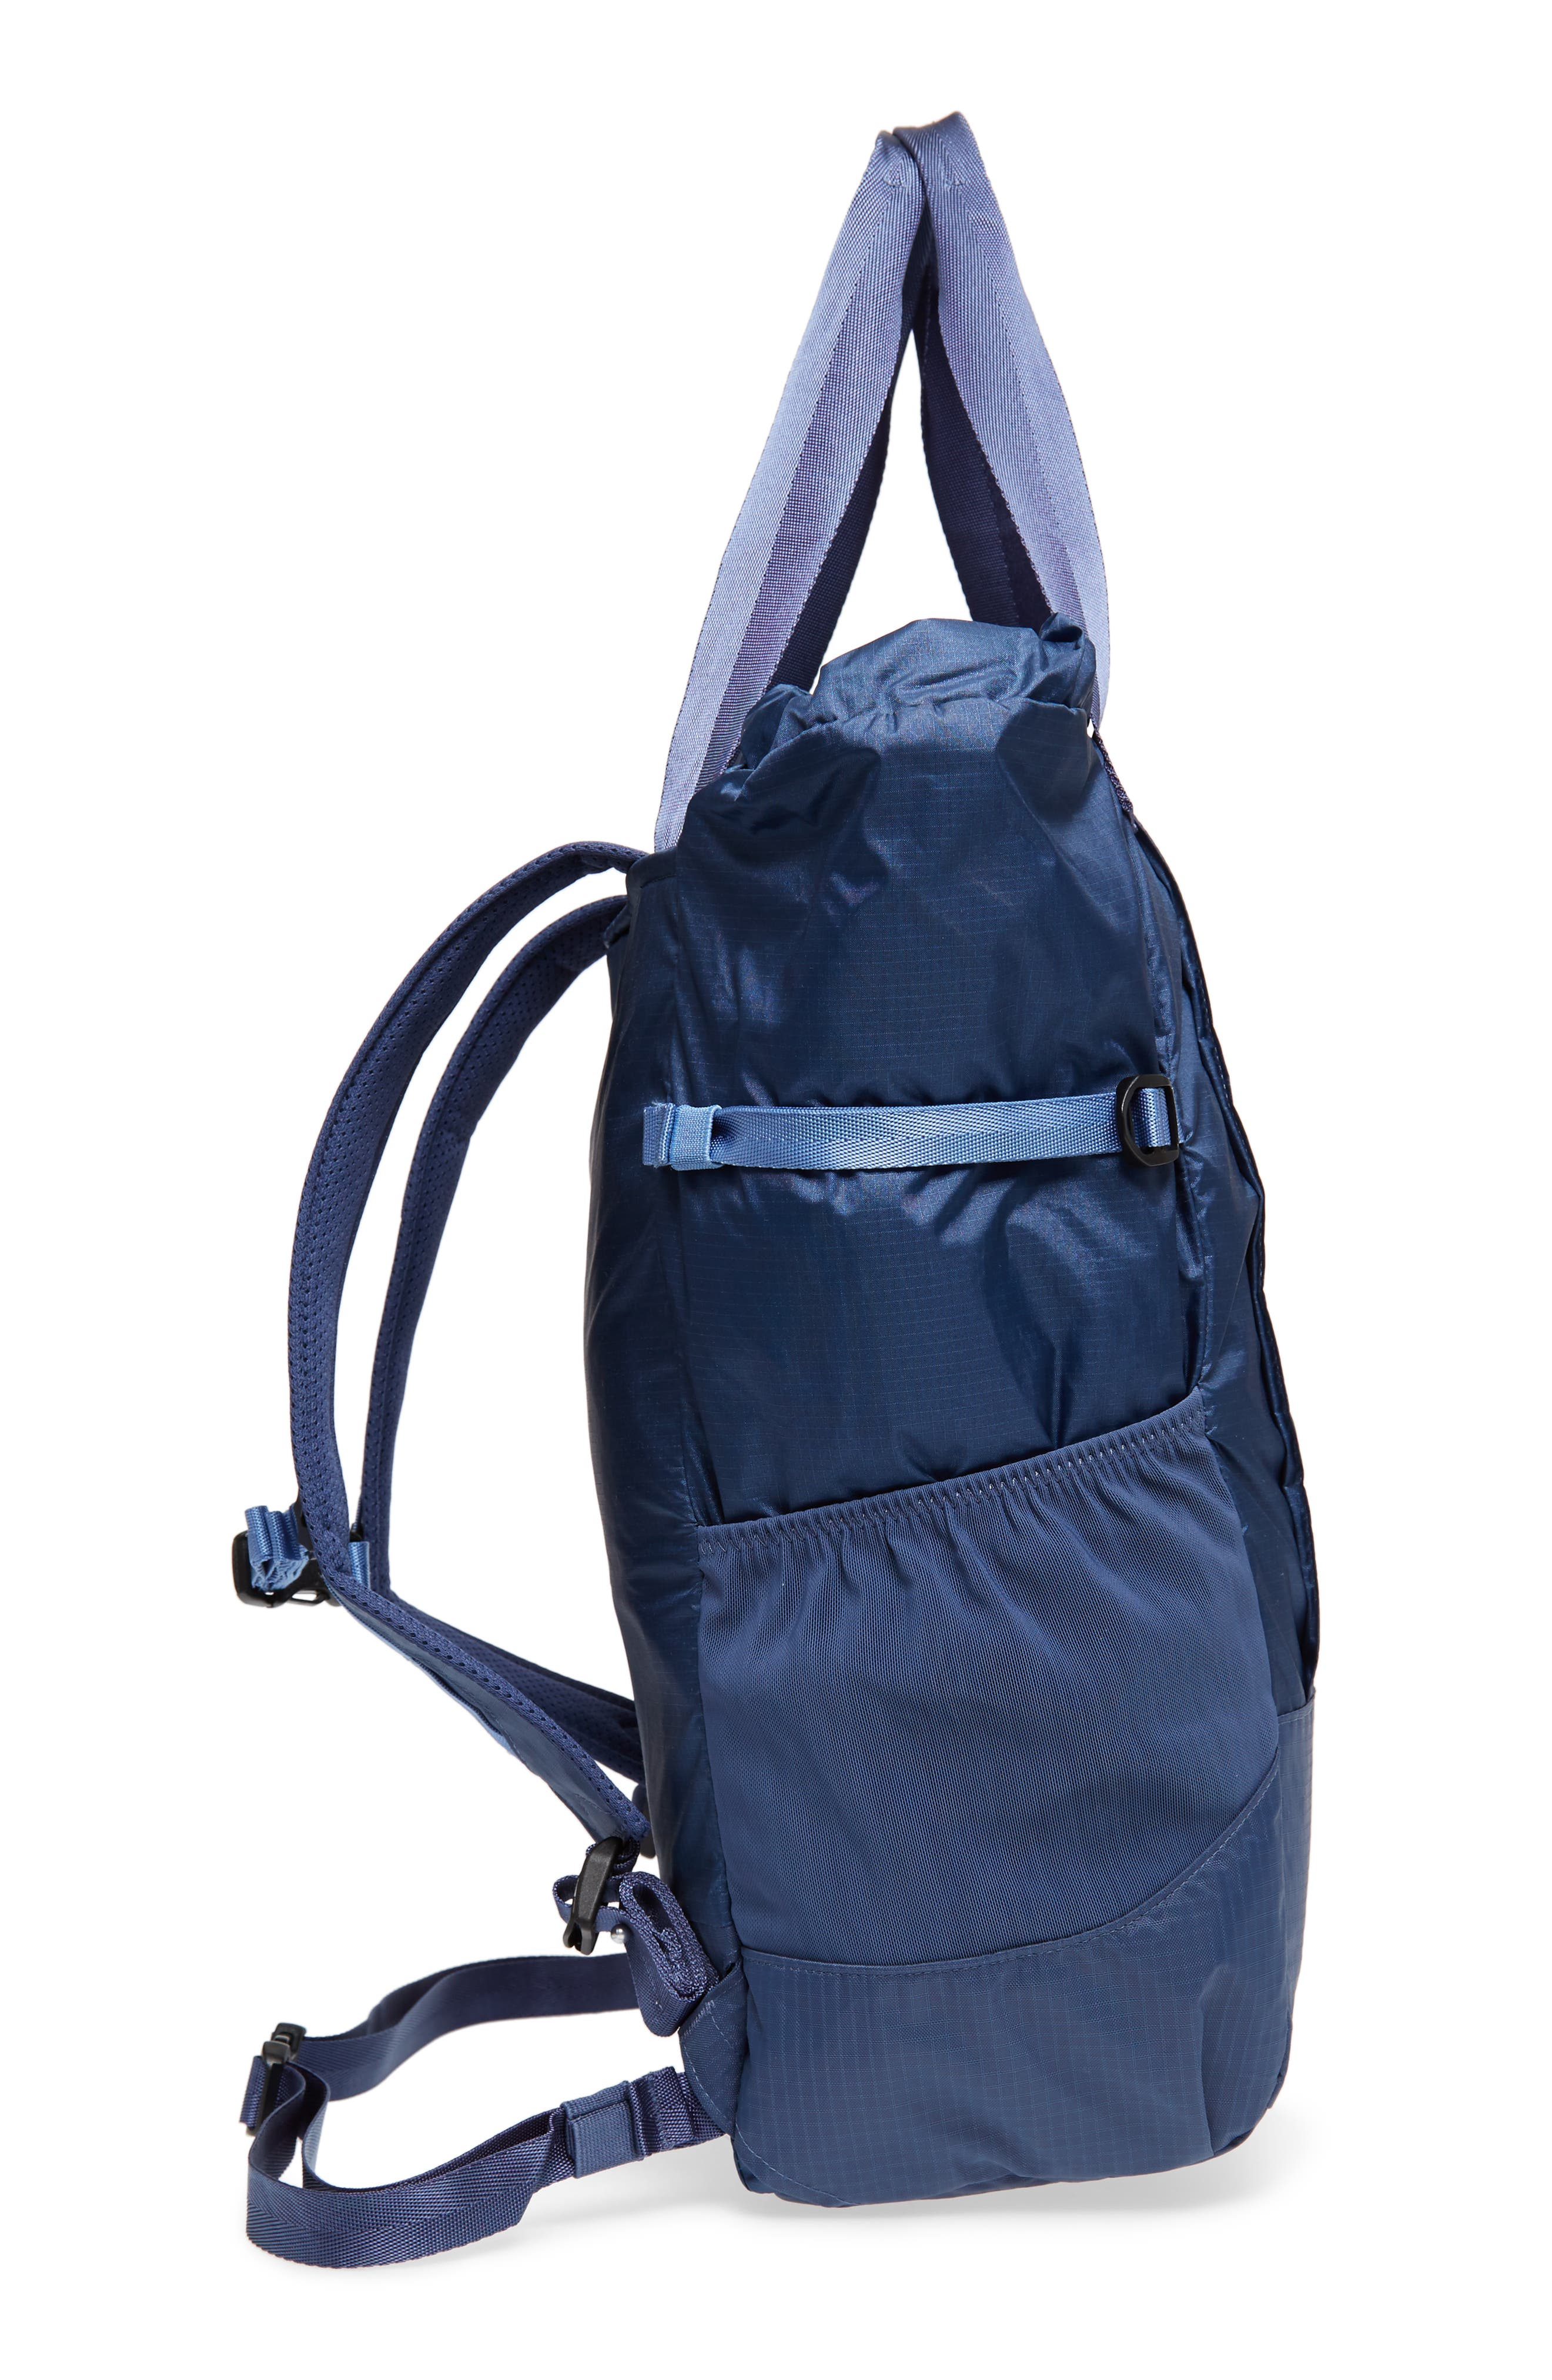 Lightweight Travel Tote Pack,                             Alternate thumbnail 4, color,                             Dolomite Blue